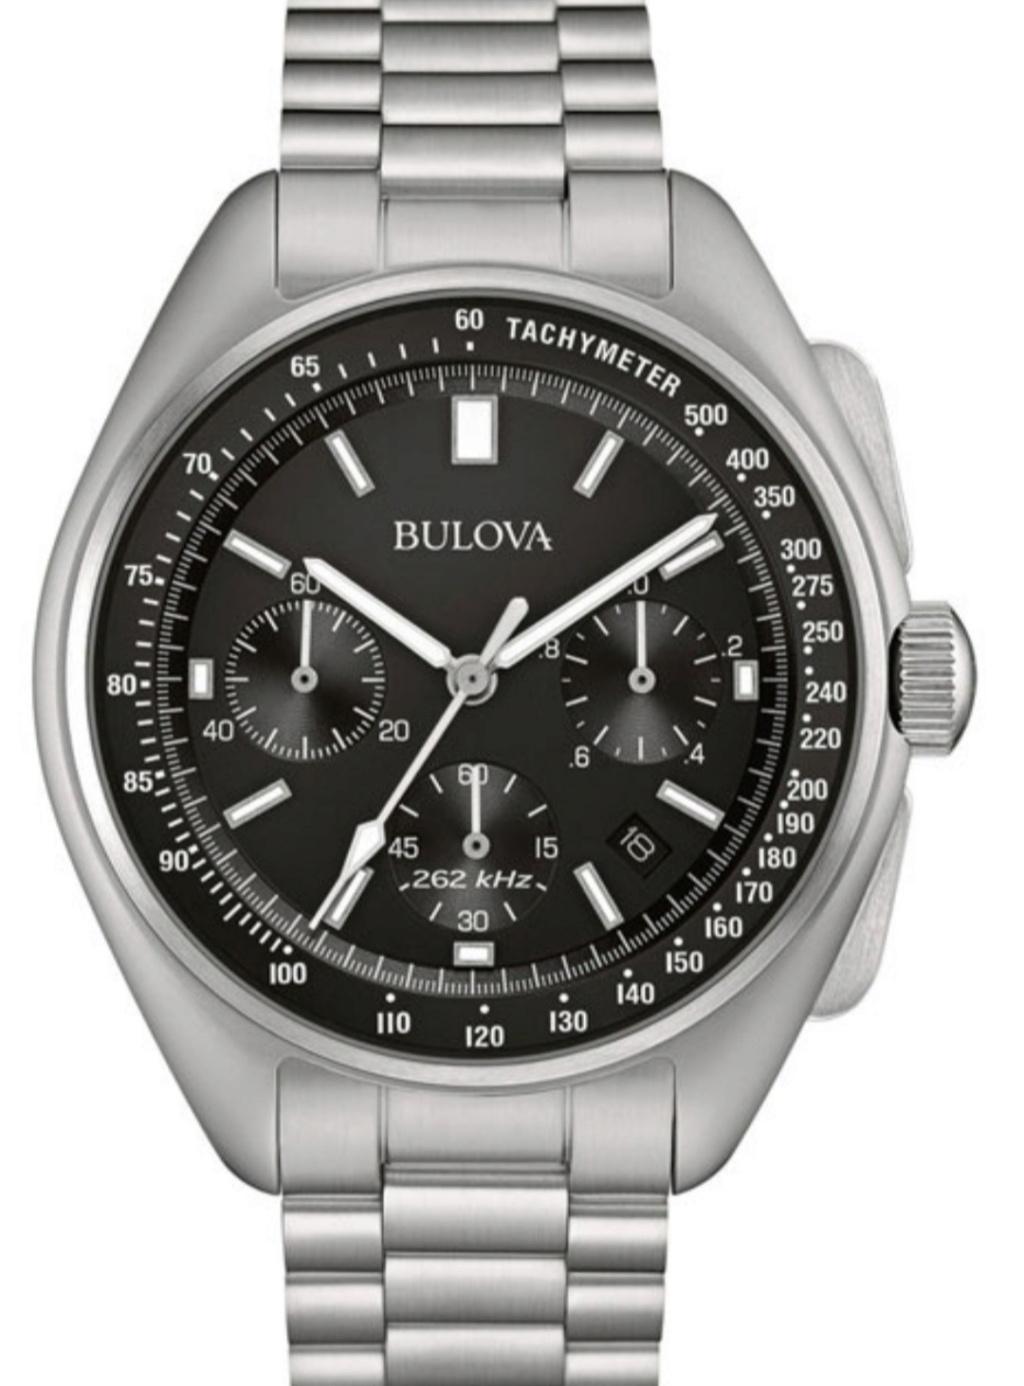 Duda compra Bulova10